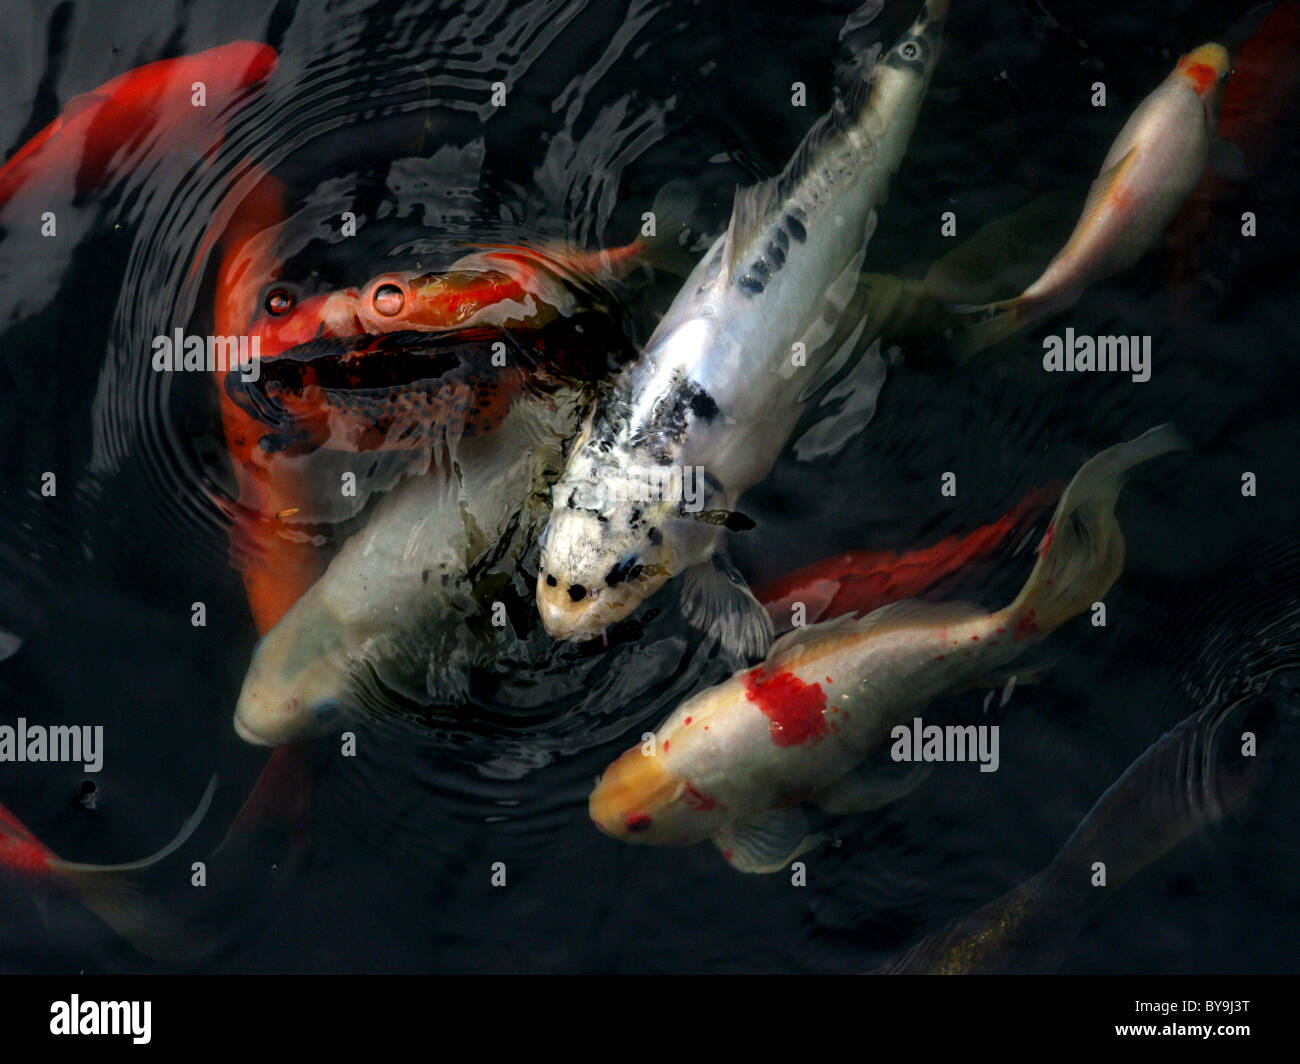 Colourful koi carp swimming together. - Stock Image